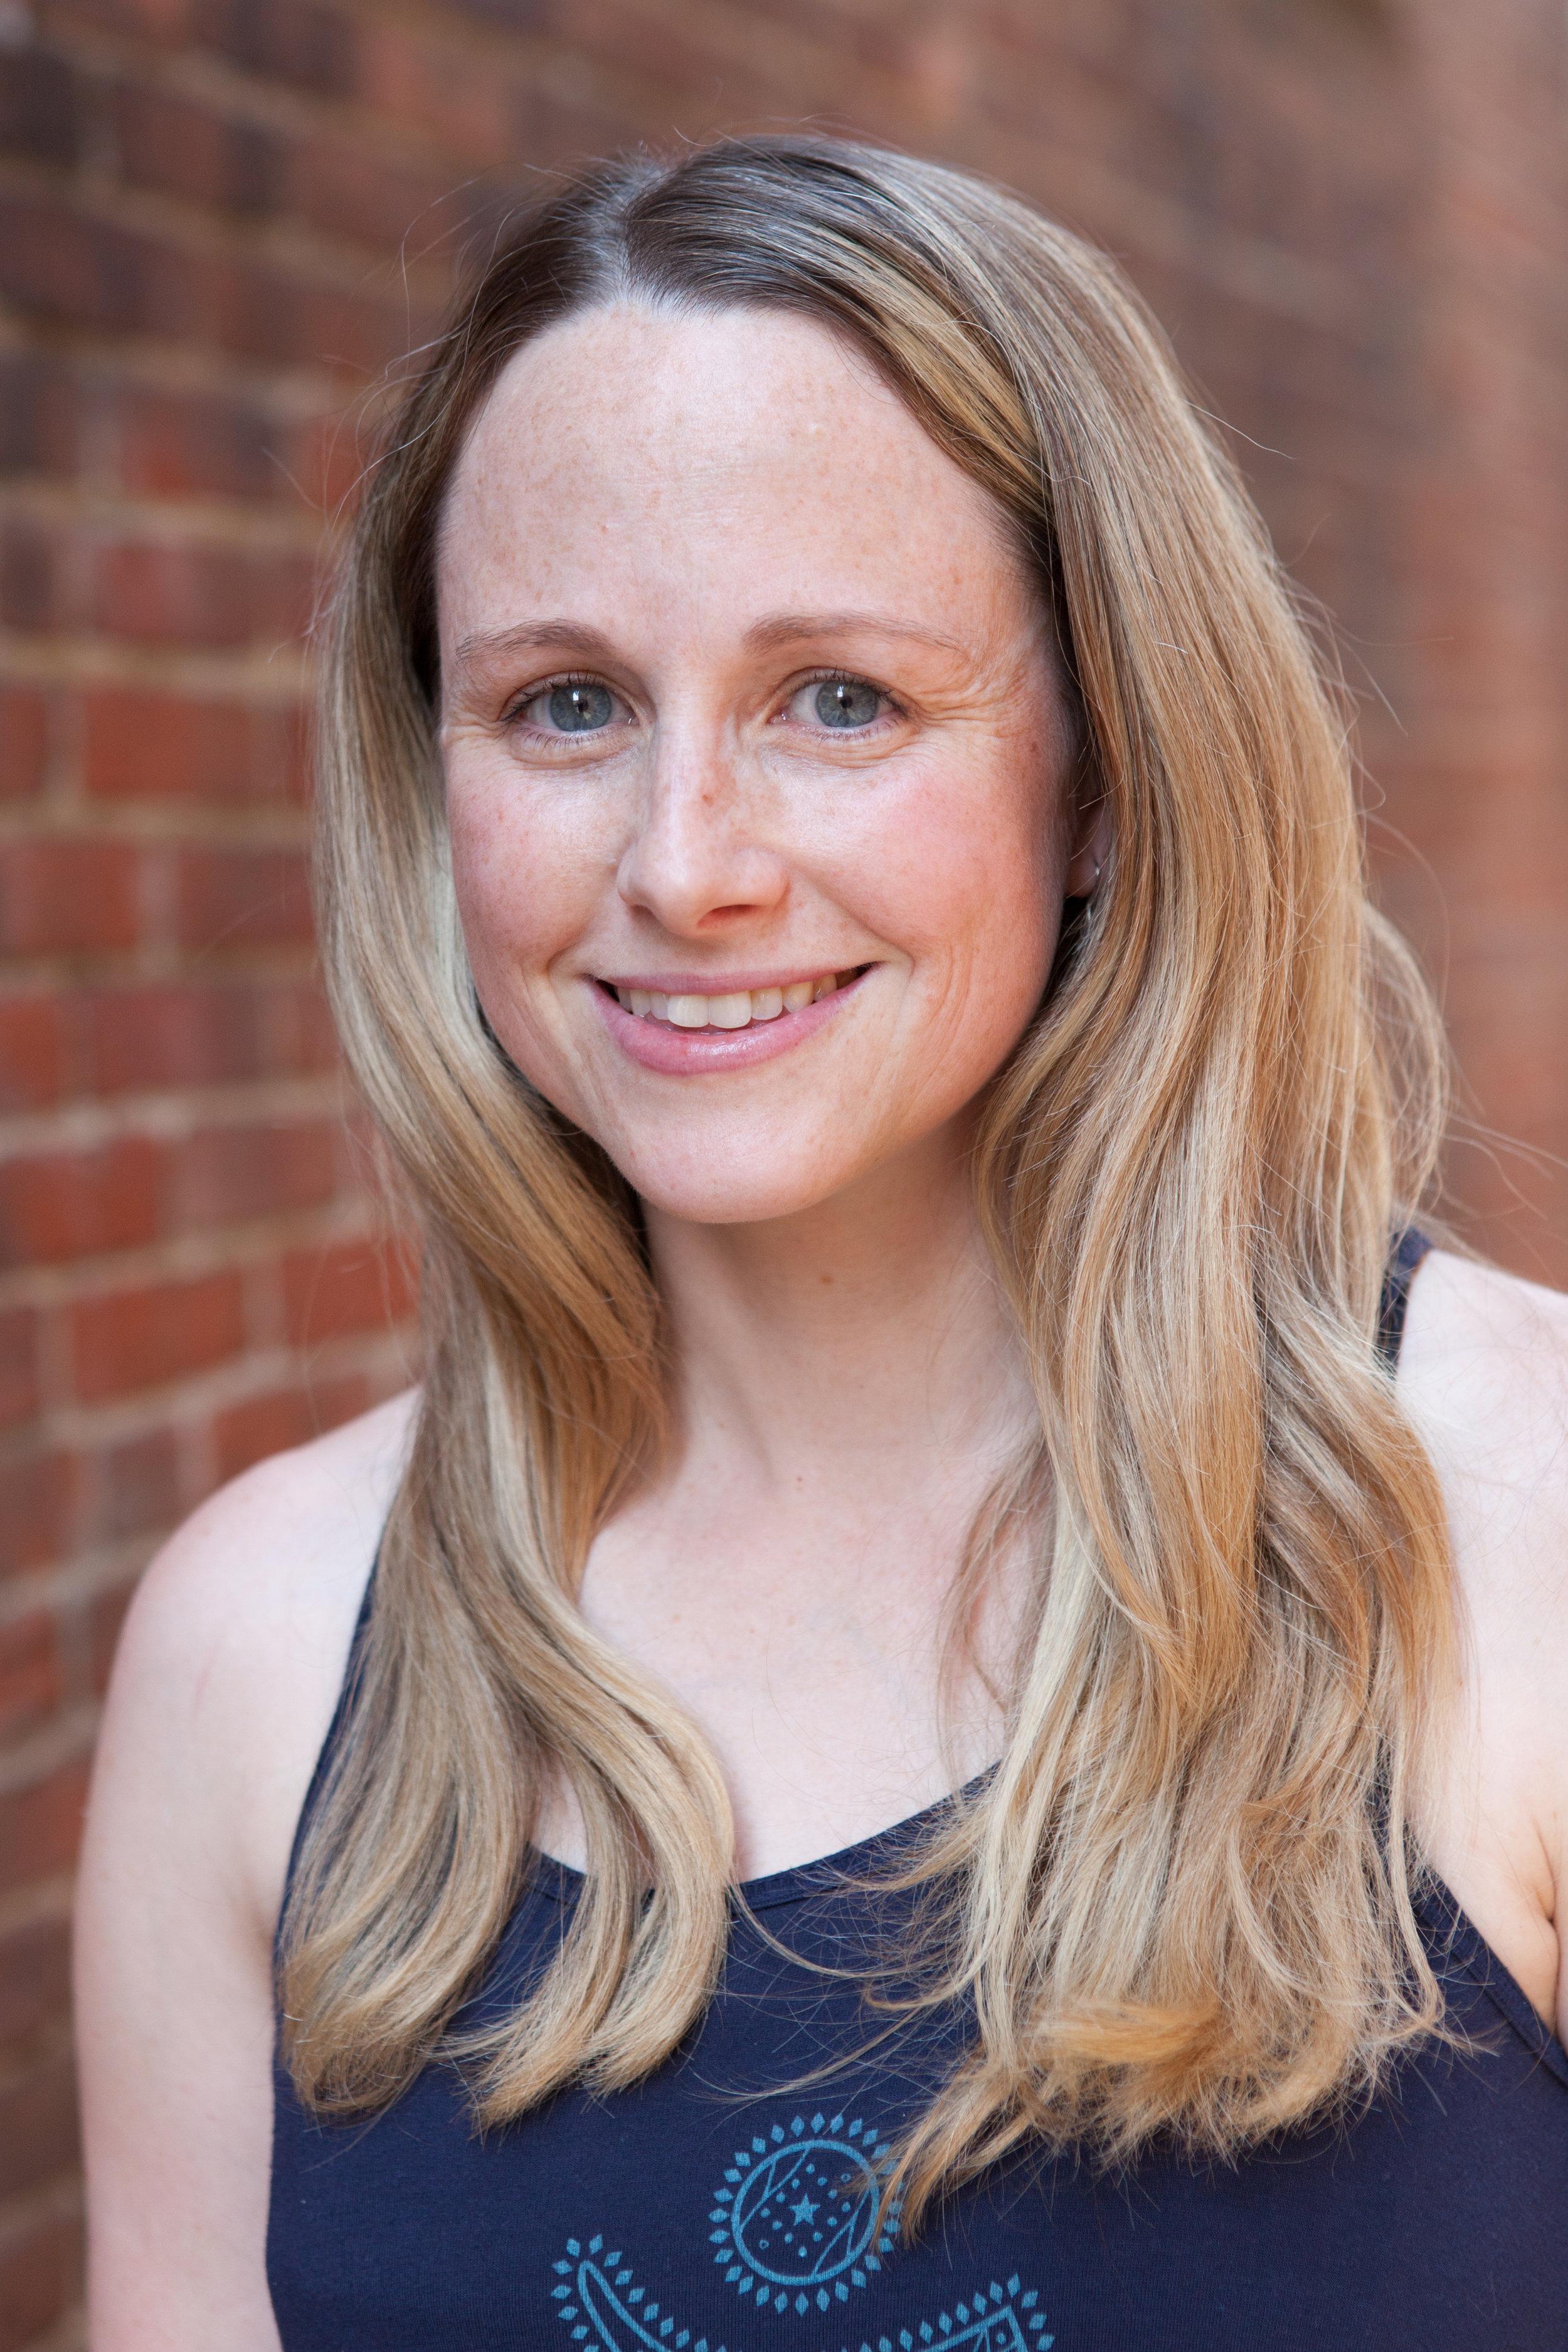 Ashley Rose-Mello